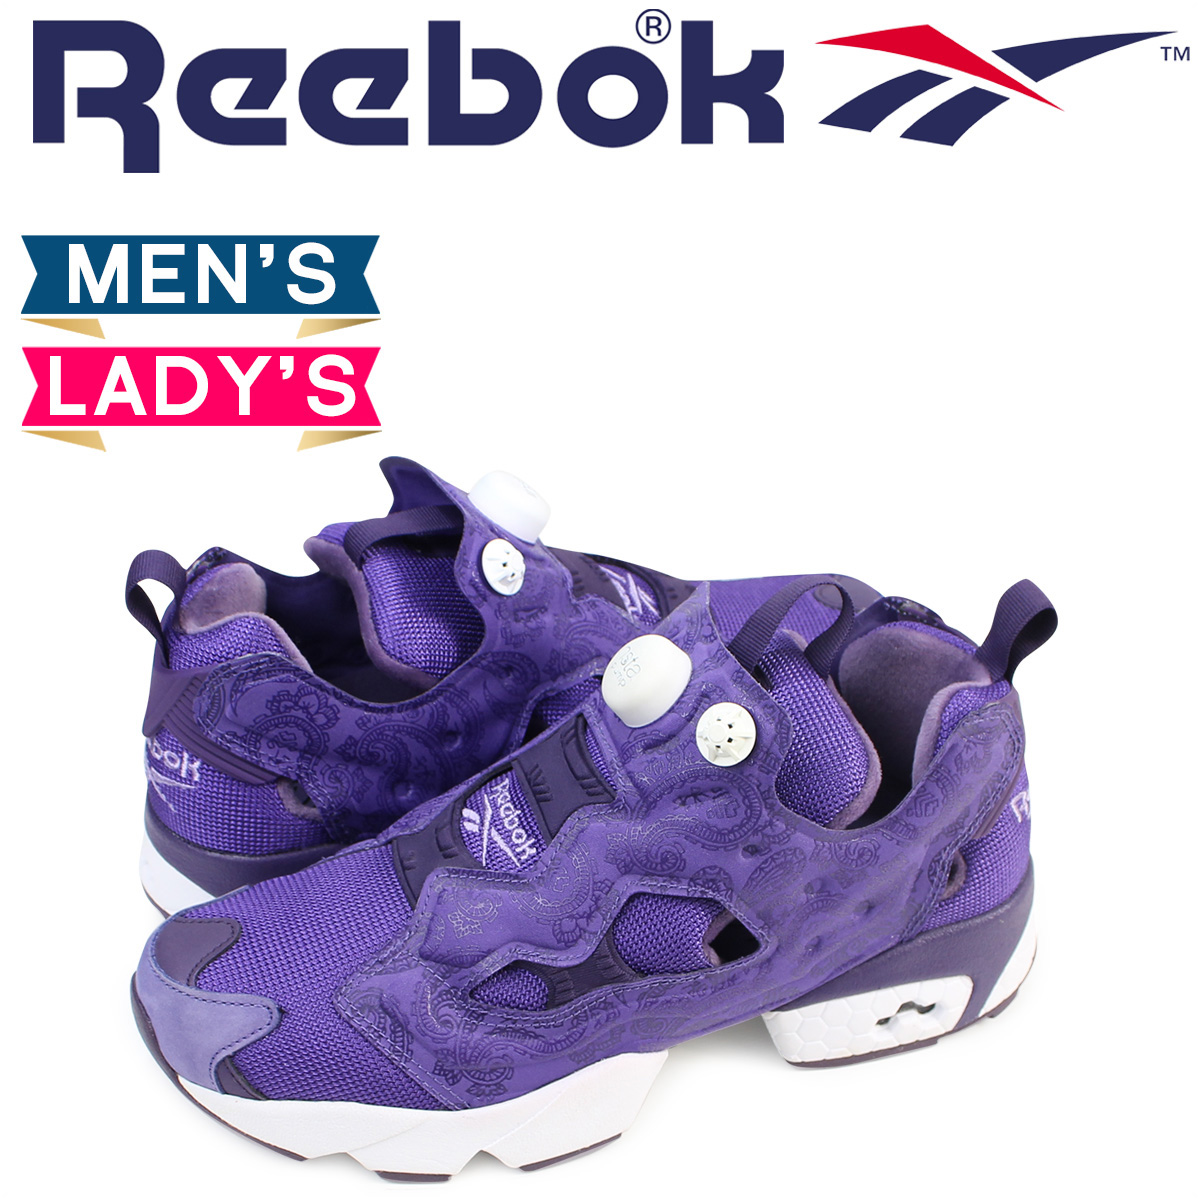 350b643b ALLSPORTS: Point 2 x Reebok Reebok INSTA PUMP FURY OG sneaker insta ...